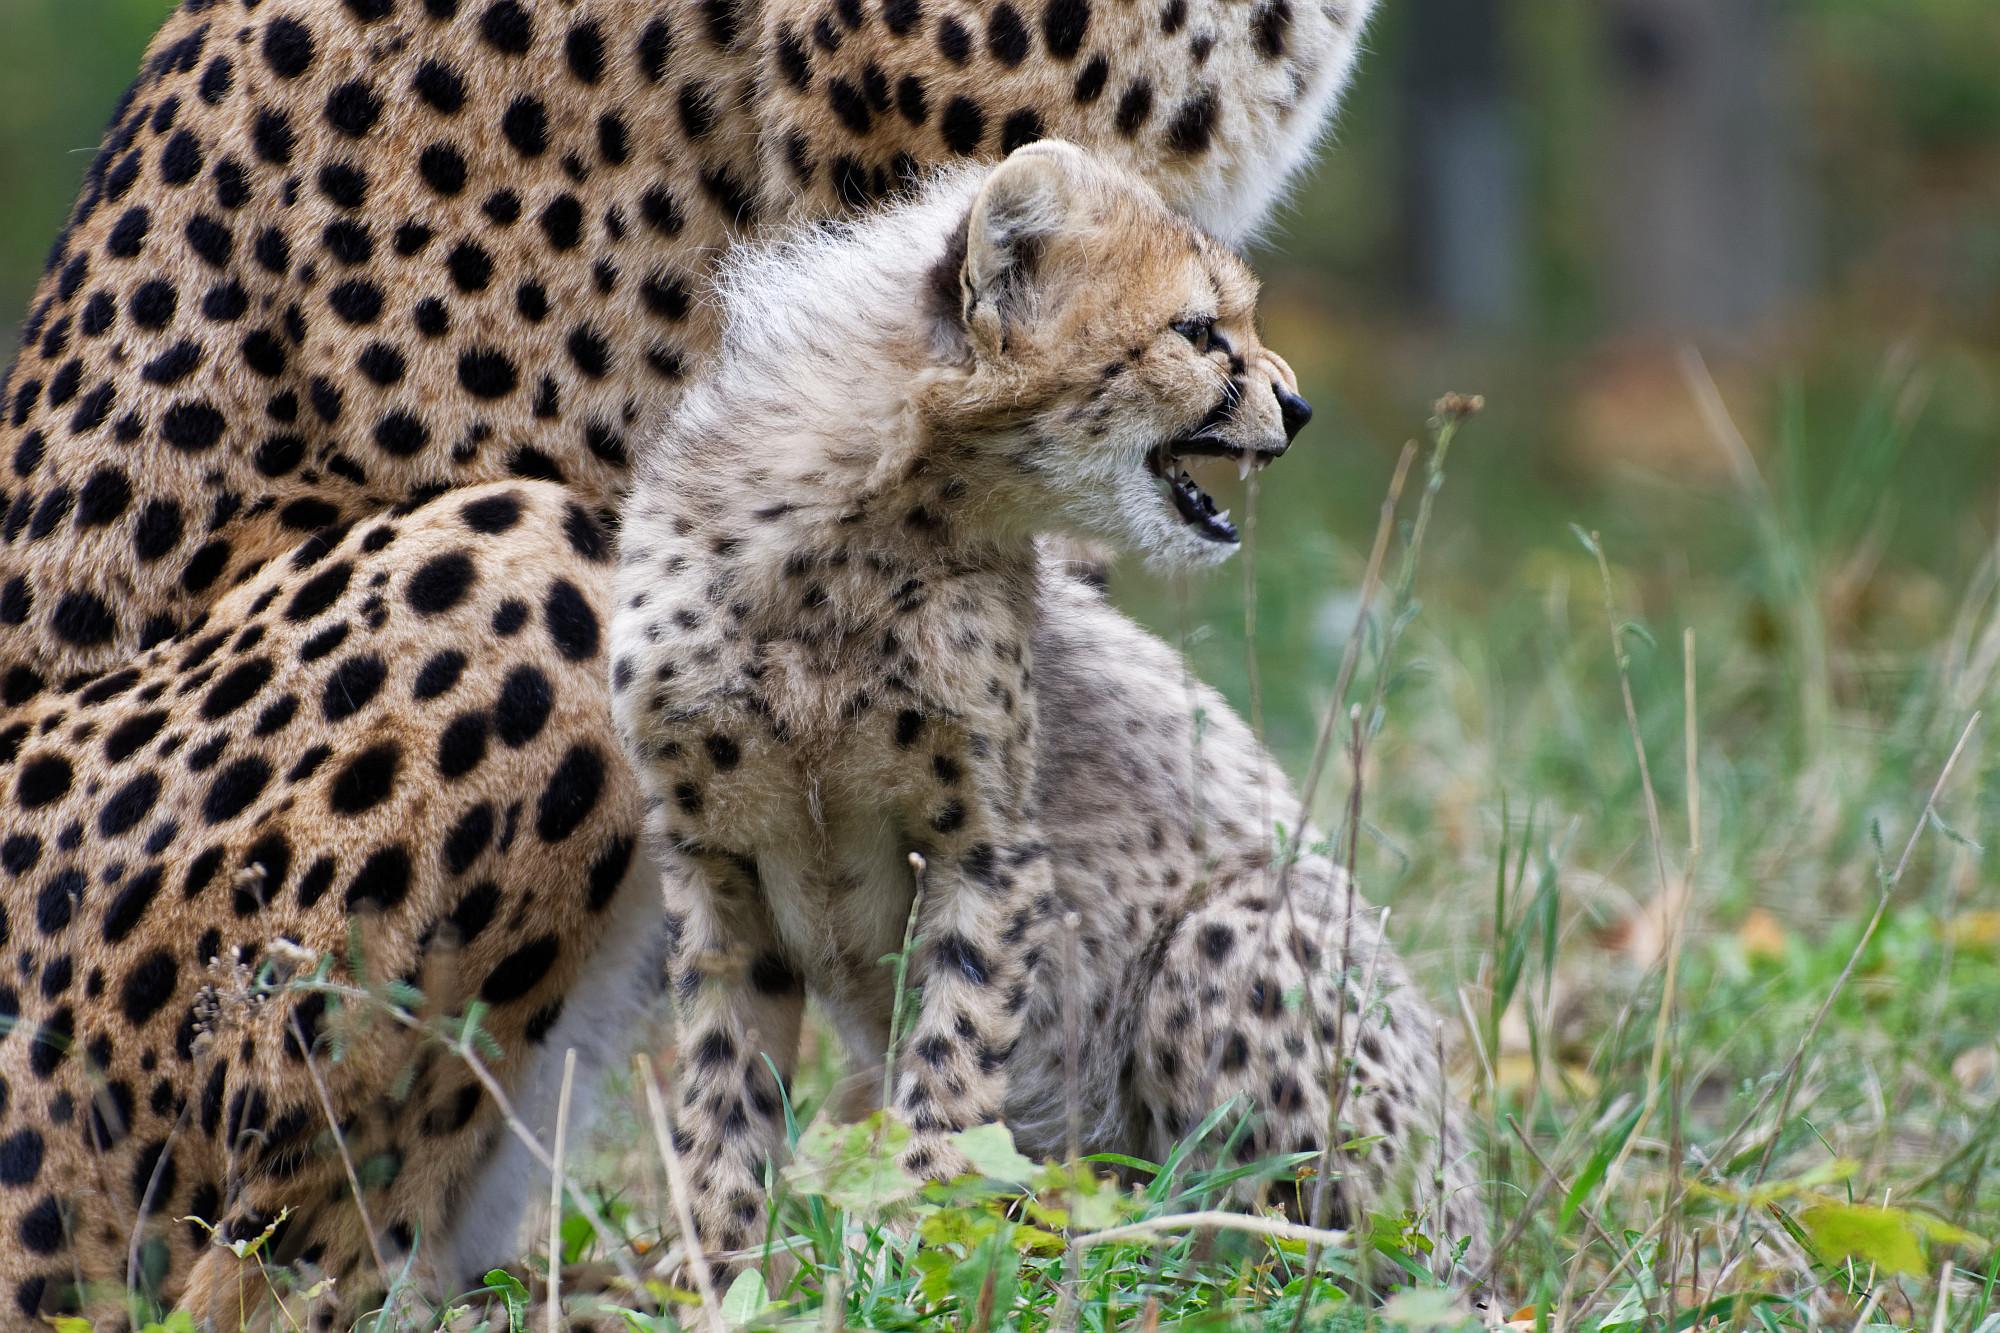 angry cheetah 2020-10-21